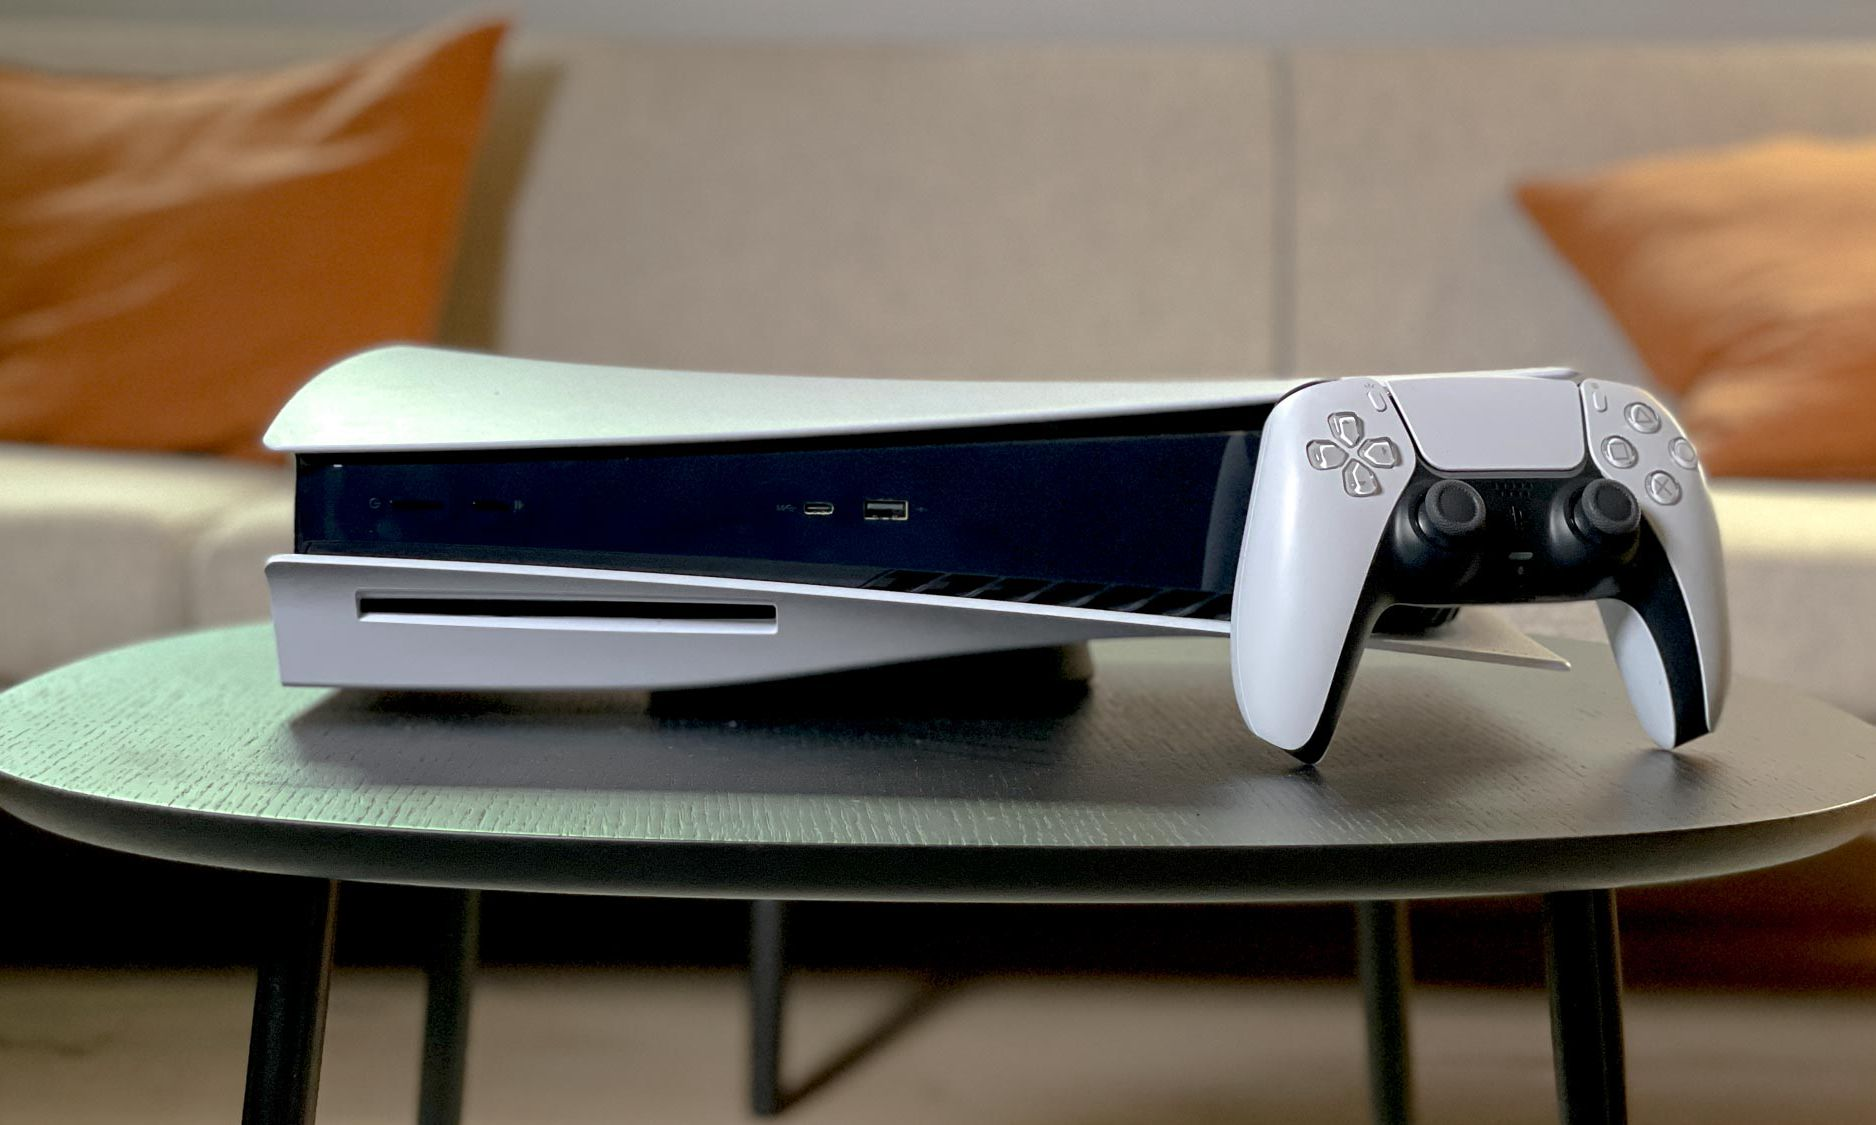 SONY 官方确认 PlayStation 5 将在近期补货